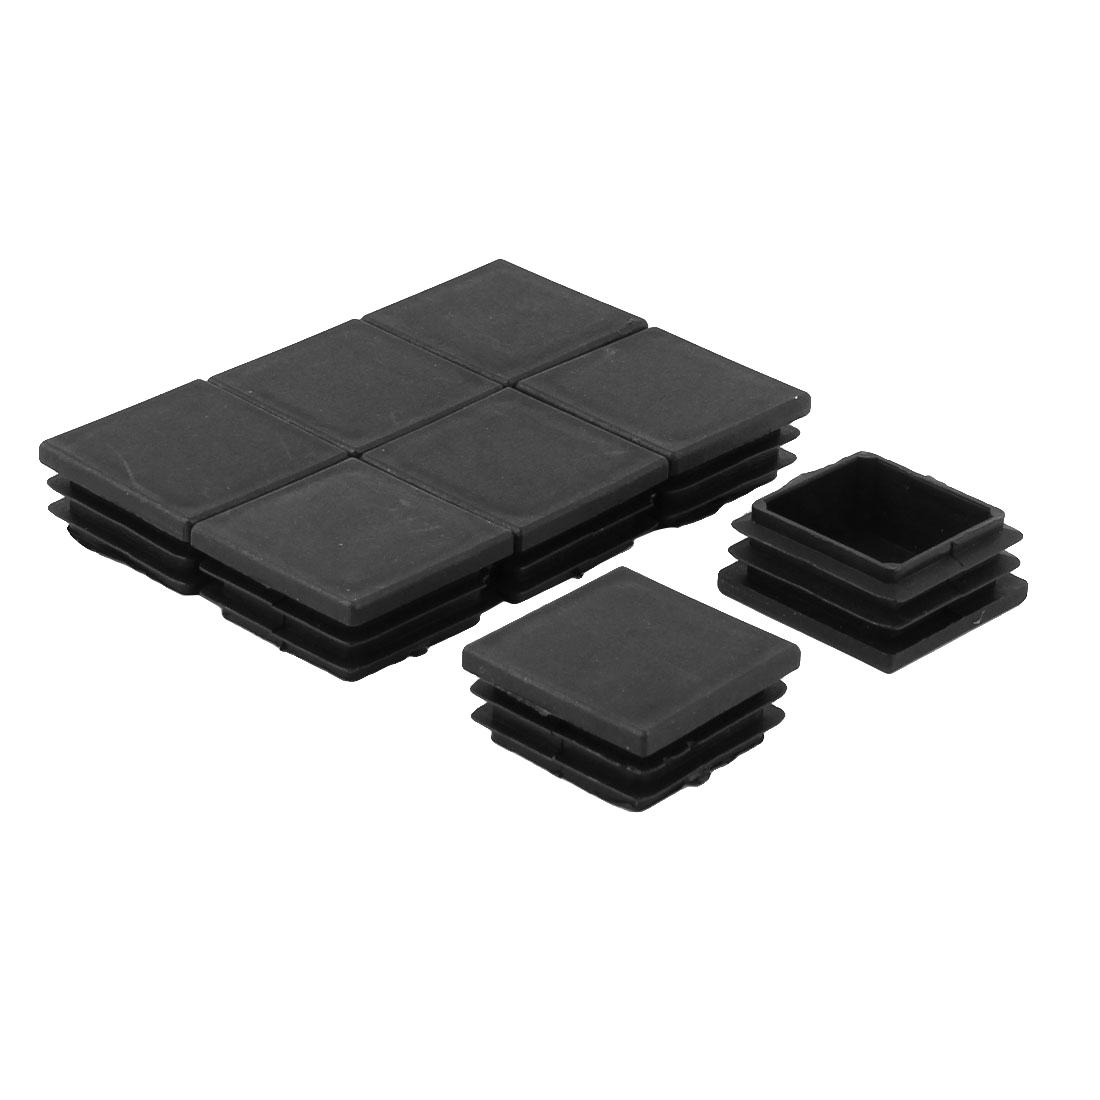 Table Chair Feet Plastic Square Tube Inserts End Blanking Caps Black 8pcs